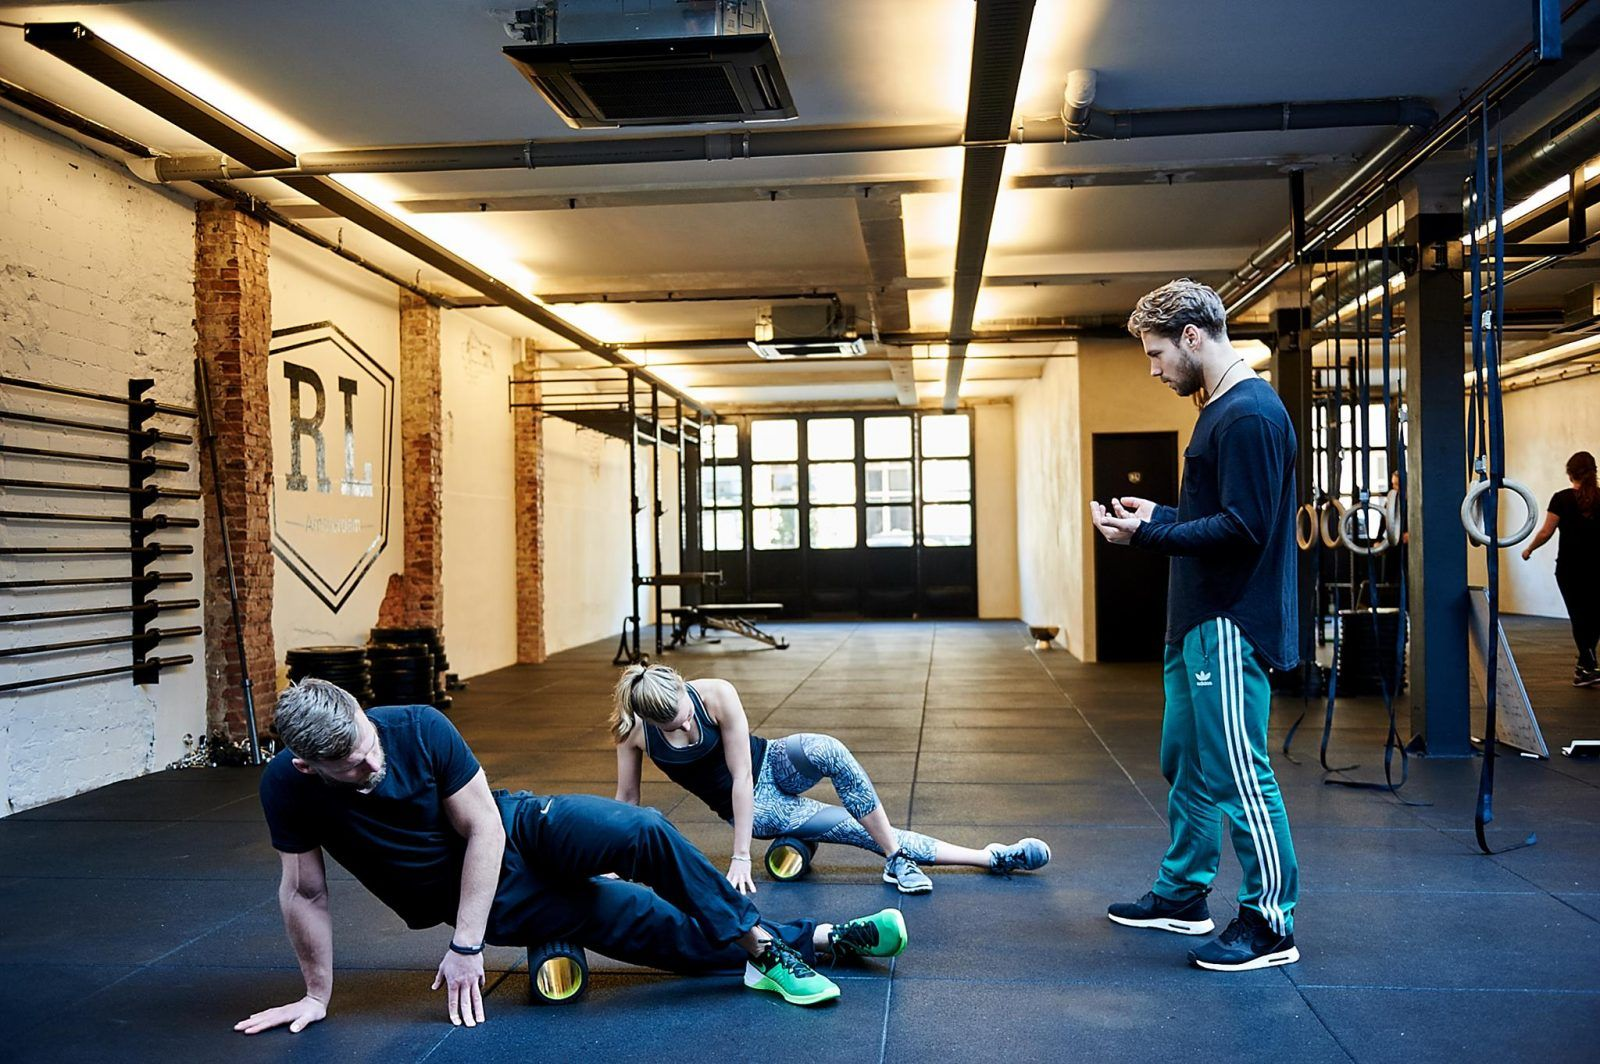 Rockstar Lifestyle, boutique fitnessclub